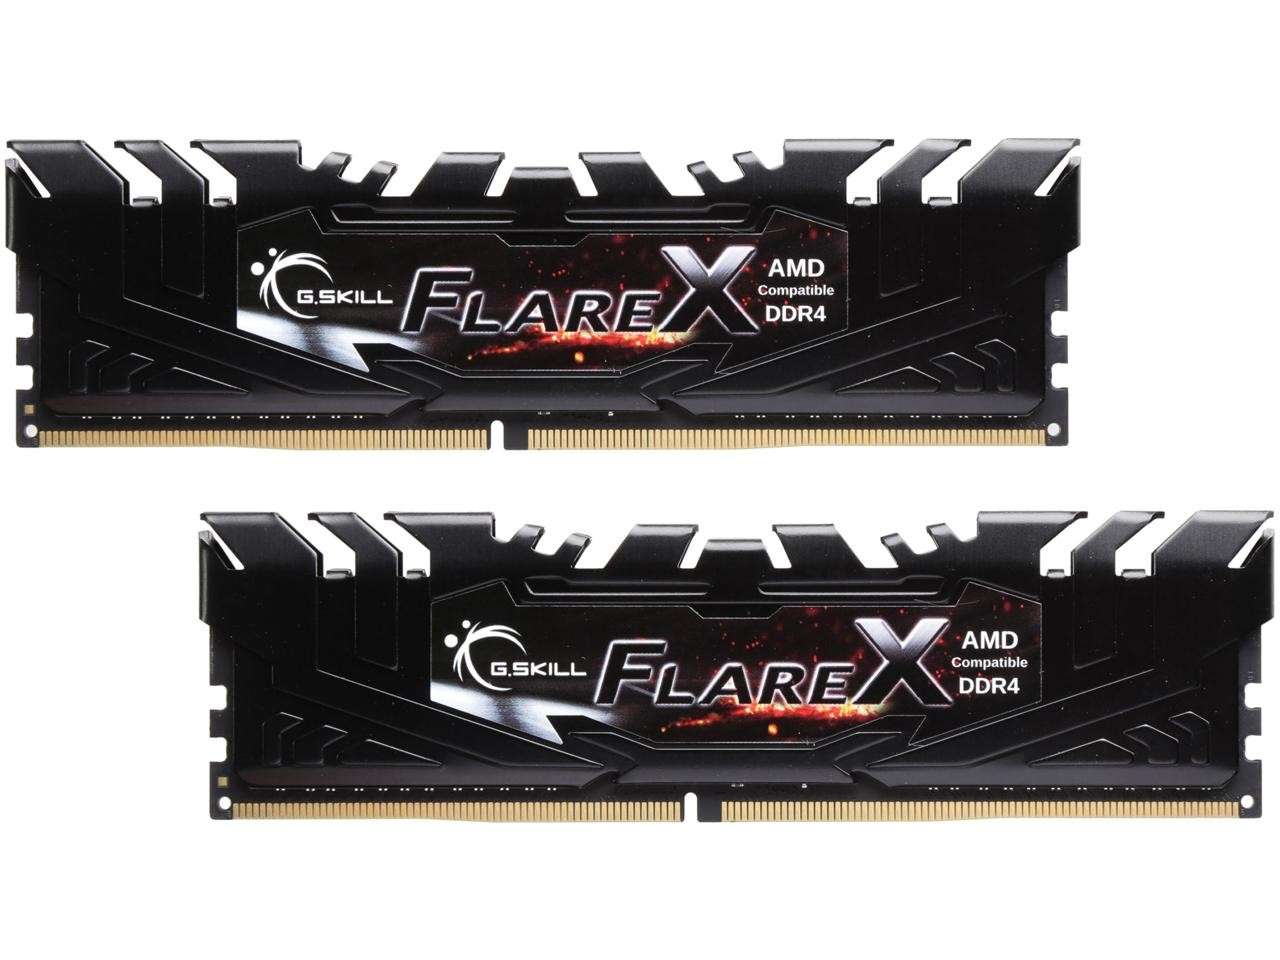 RAM PC DDR4 GKILL 8GB F4-2400C16S-8GFXR Flare-X(AMD)